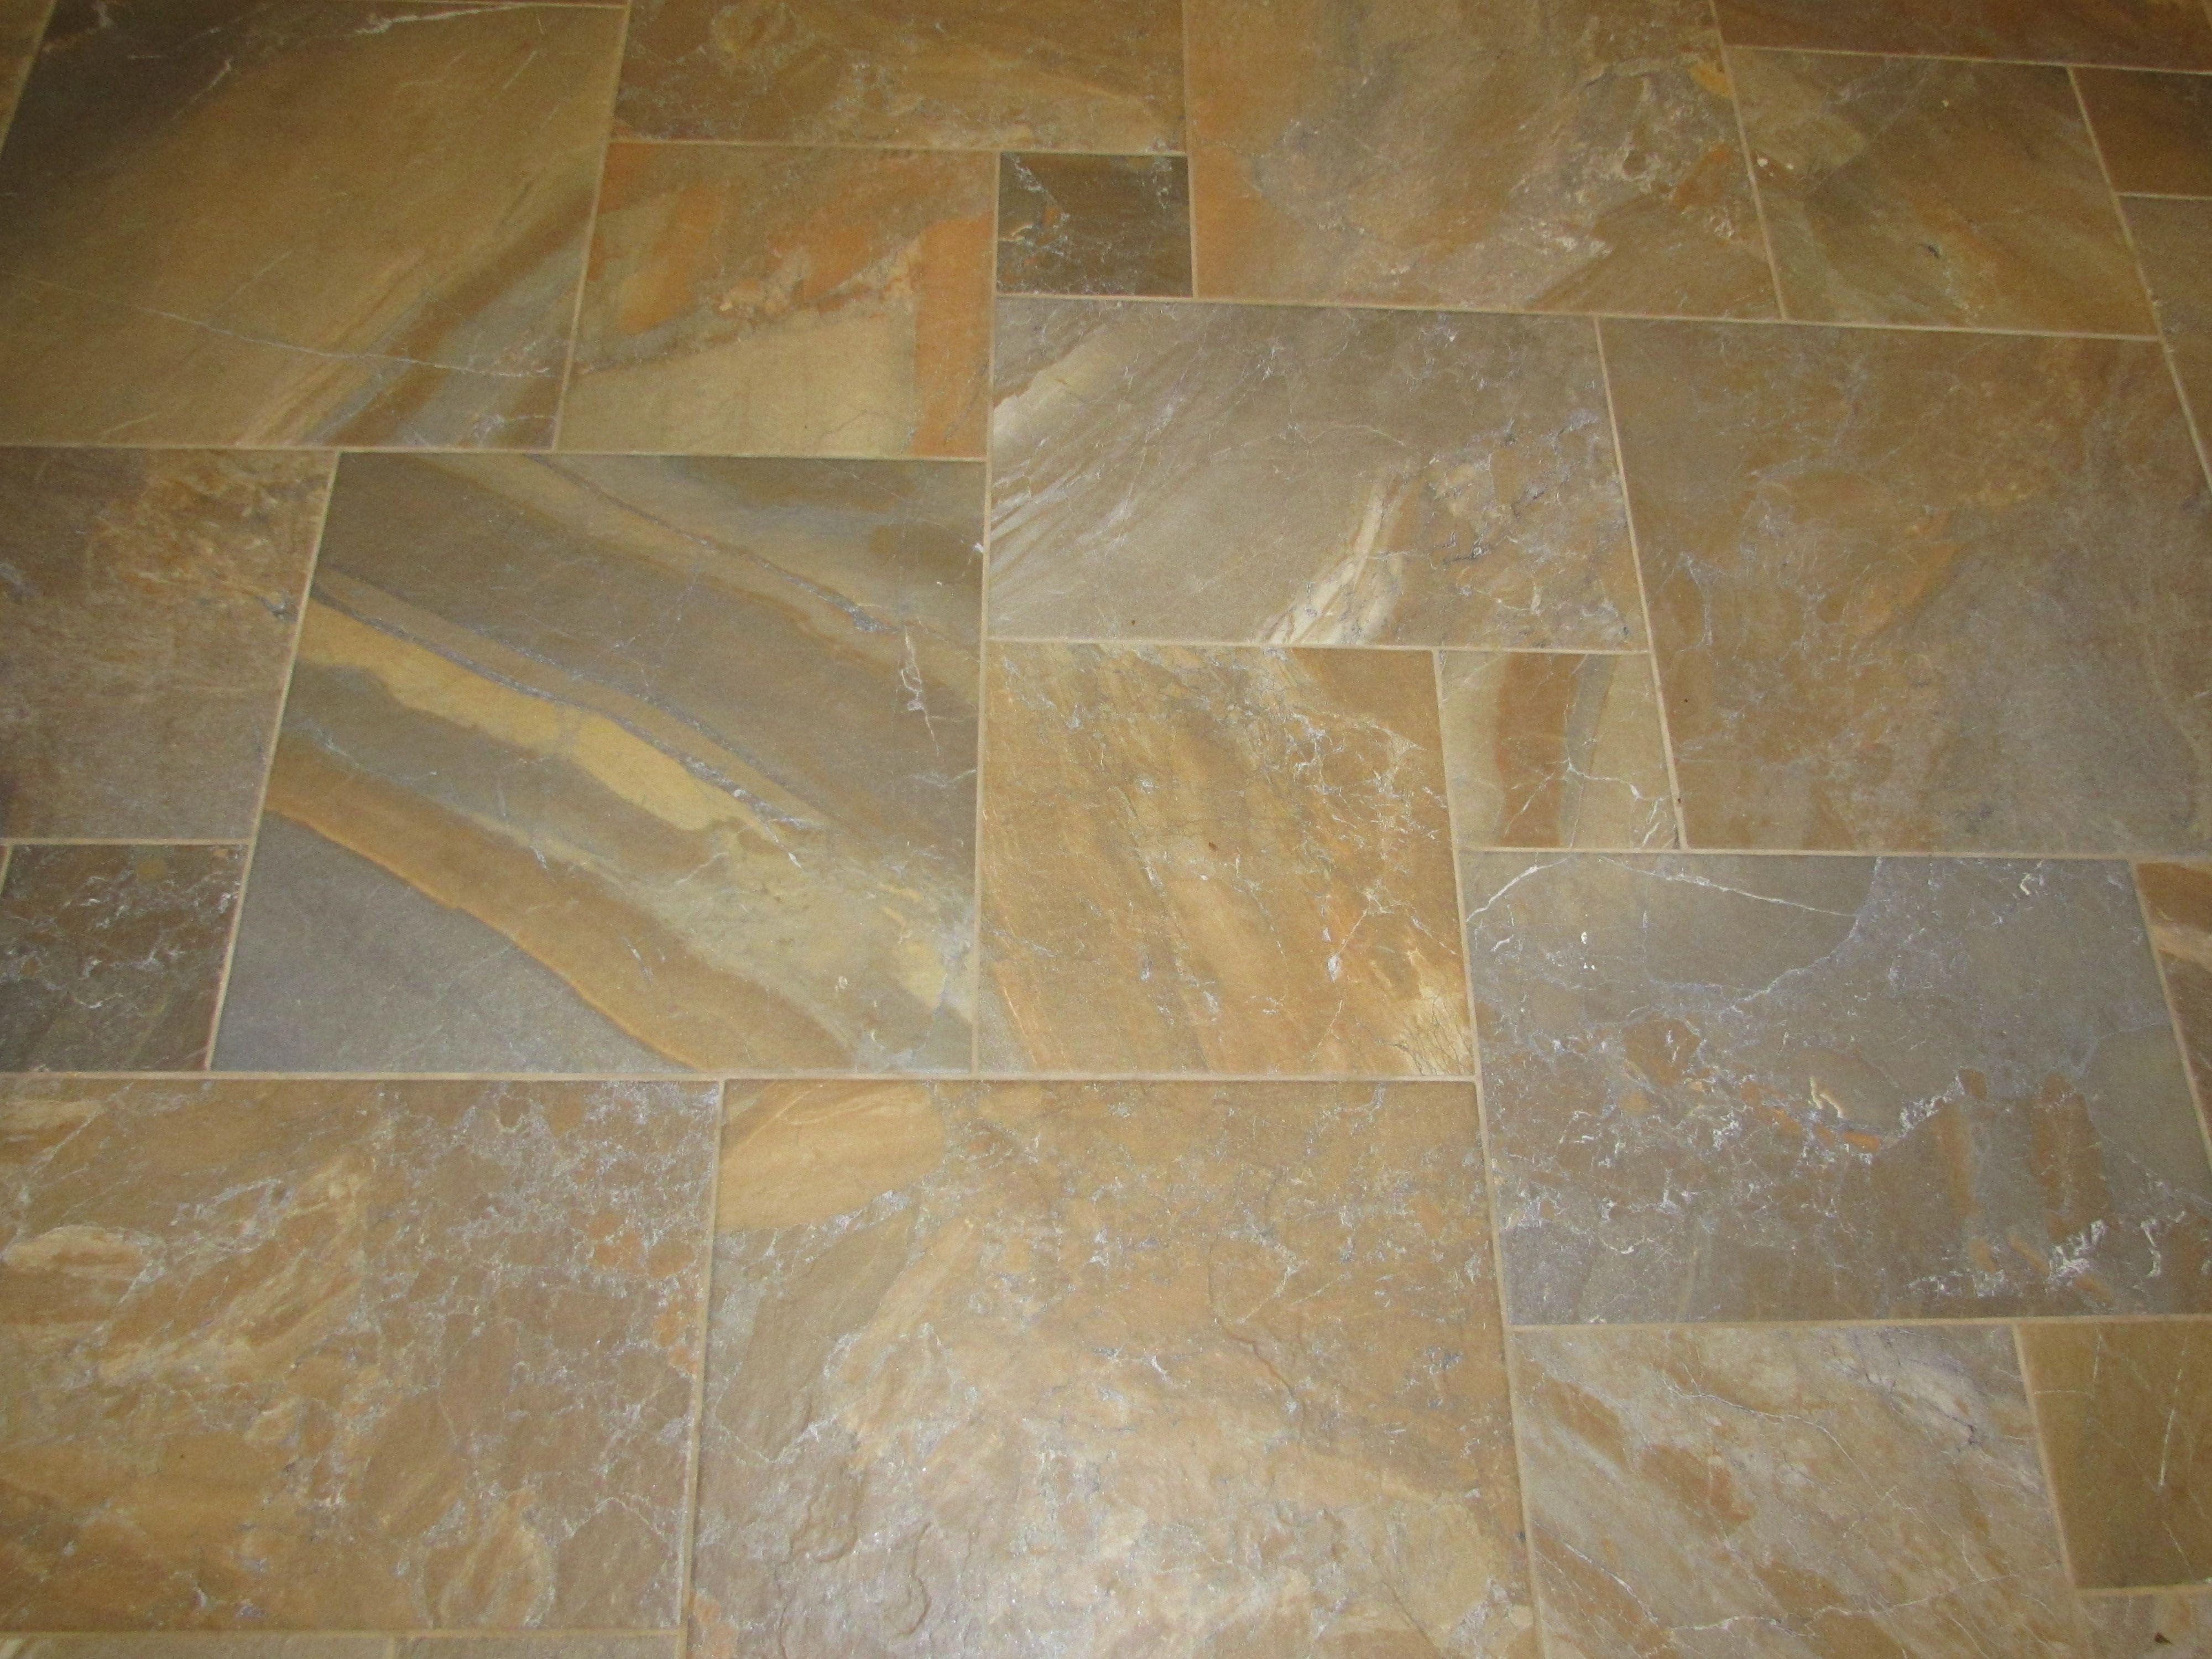 new floor tile daltile ayers rock